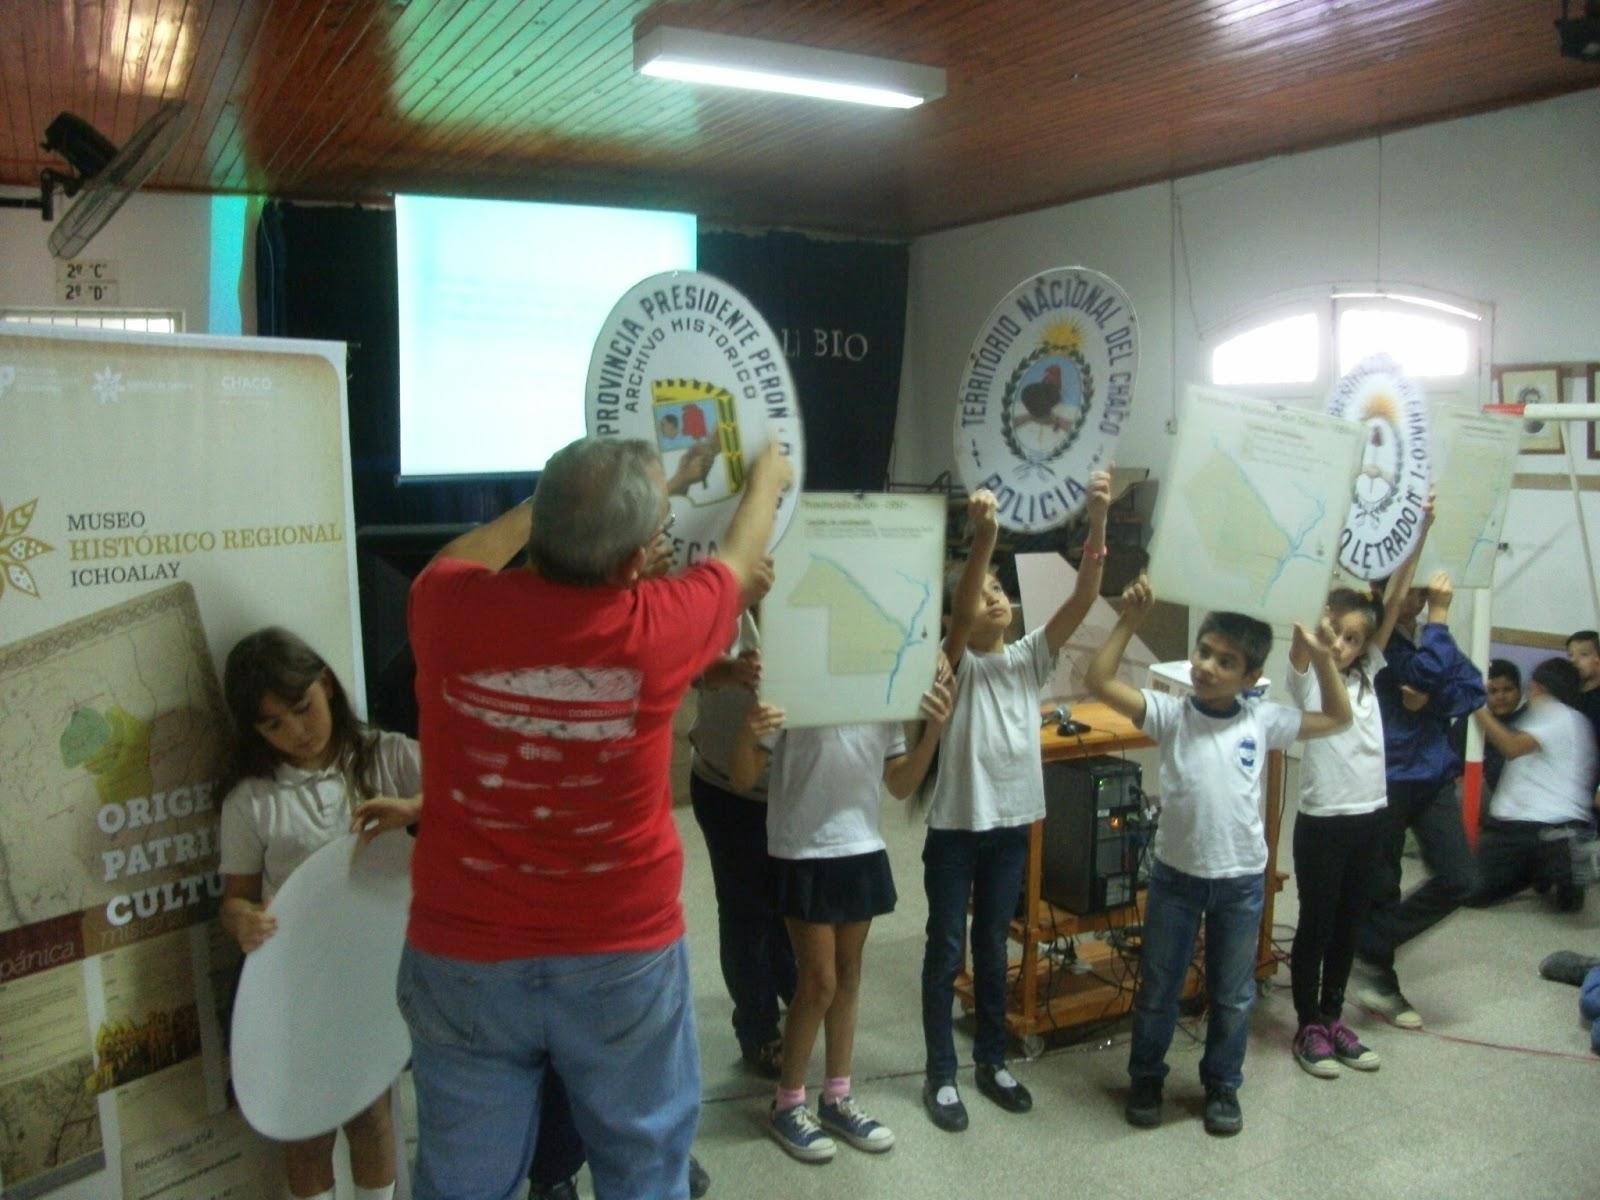 Ichoalay, Visitas, Charlas 2015